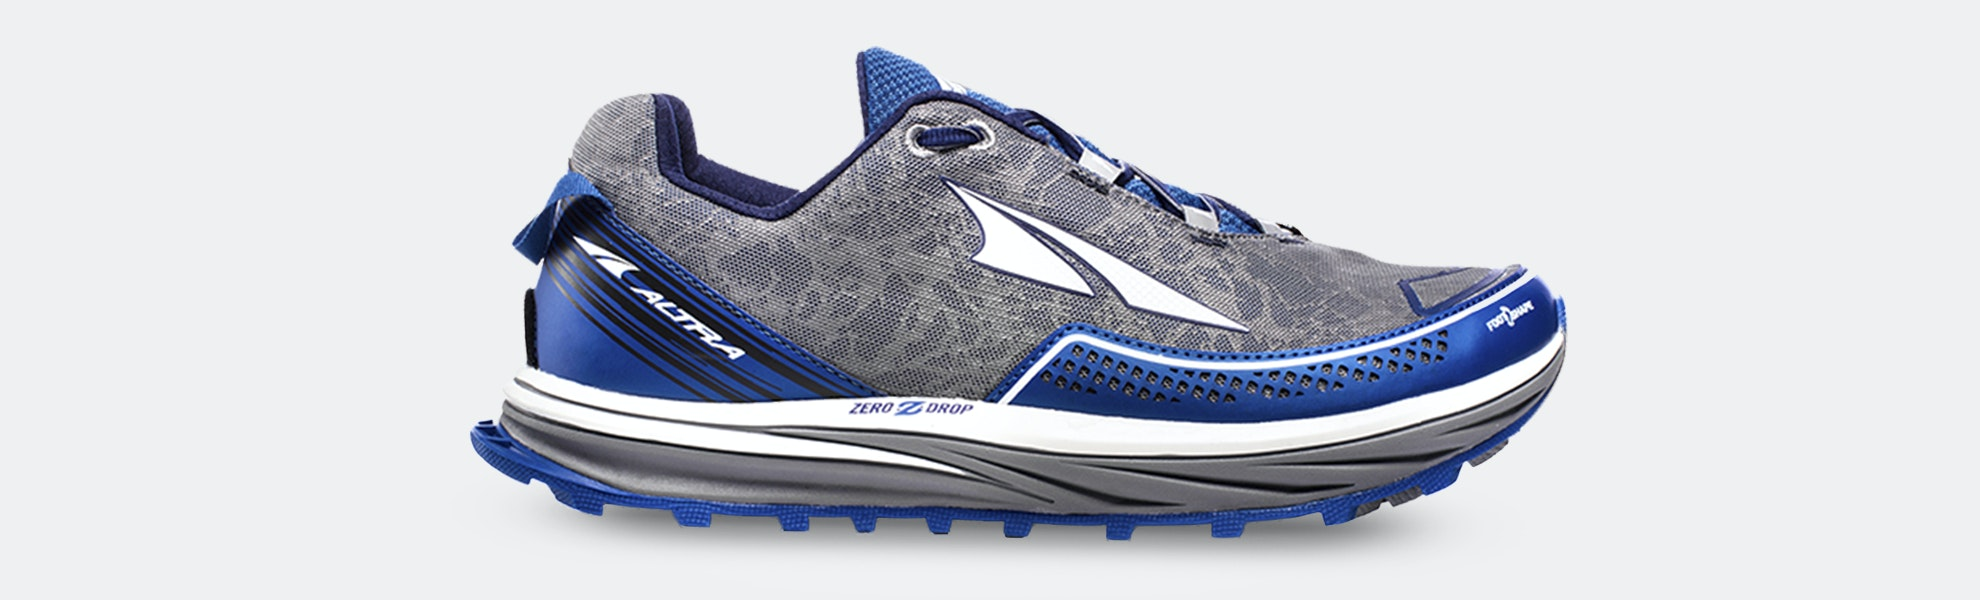 Altra Trail Reviews Shoes Massdrop Running Price amp; Timp rHwqxanSRr